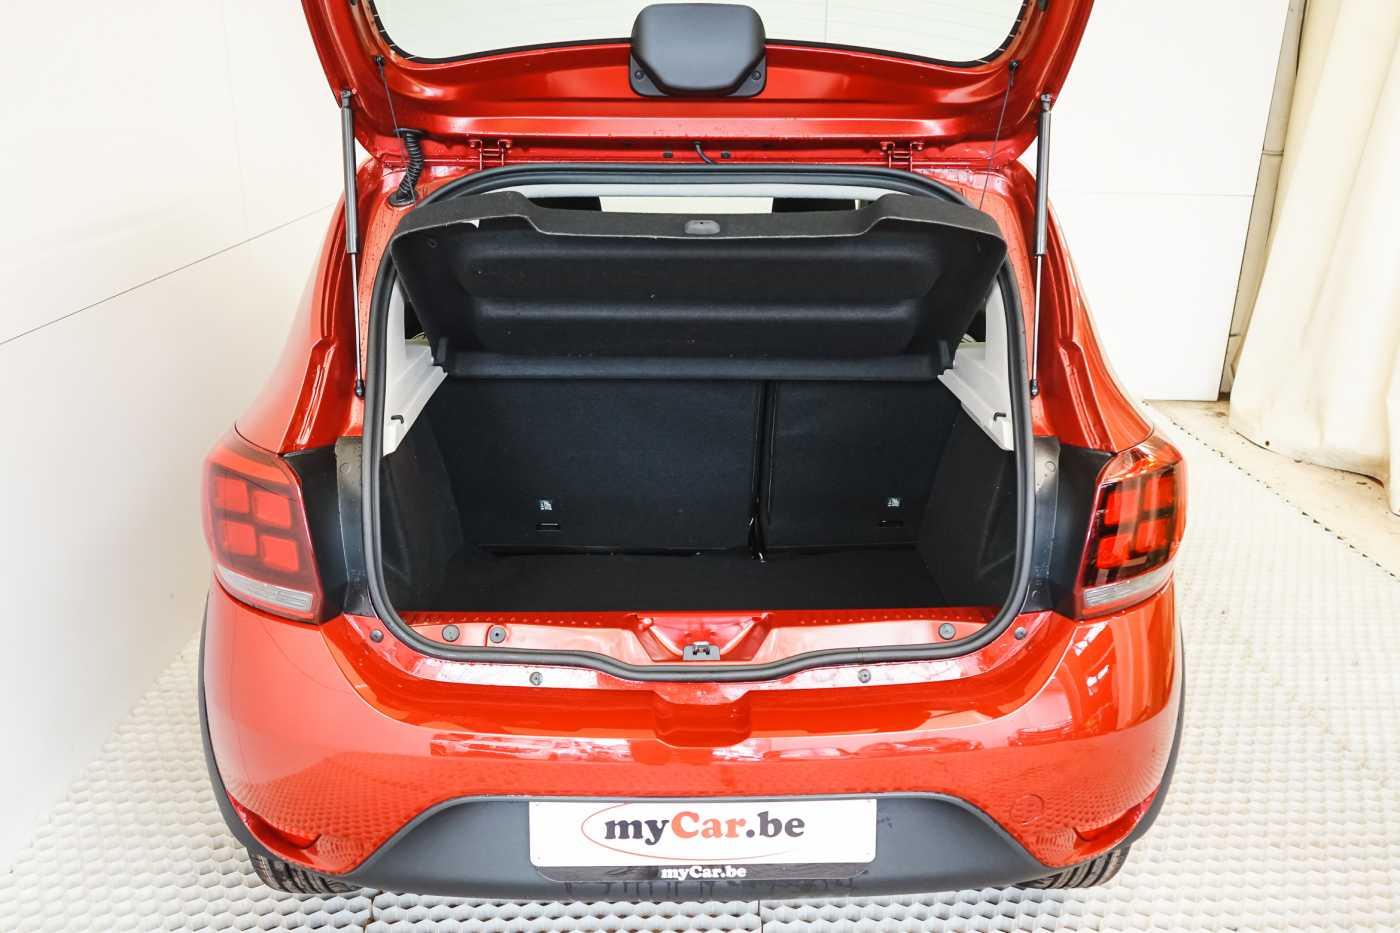 Dacia Sandero 1.0i SCe Stepway // Navi, Bluetooth, Airco, USB 7/27